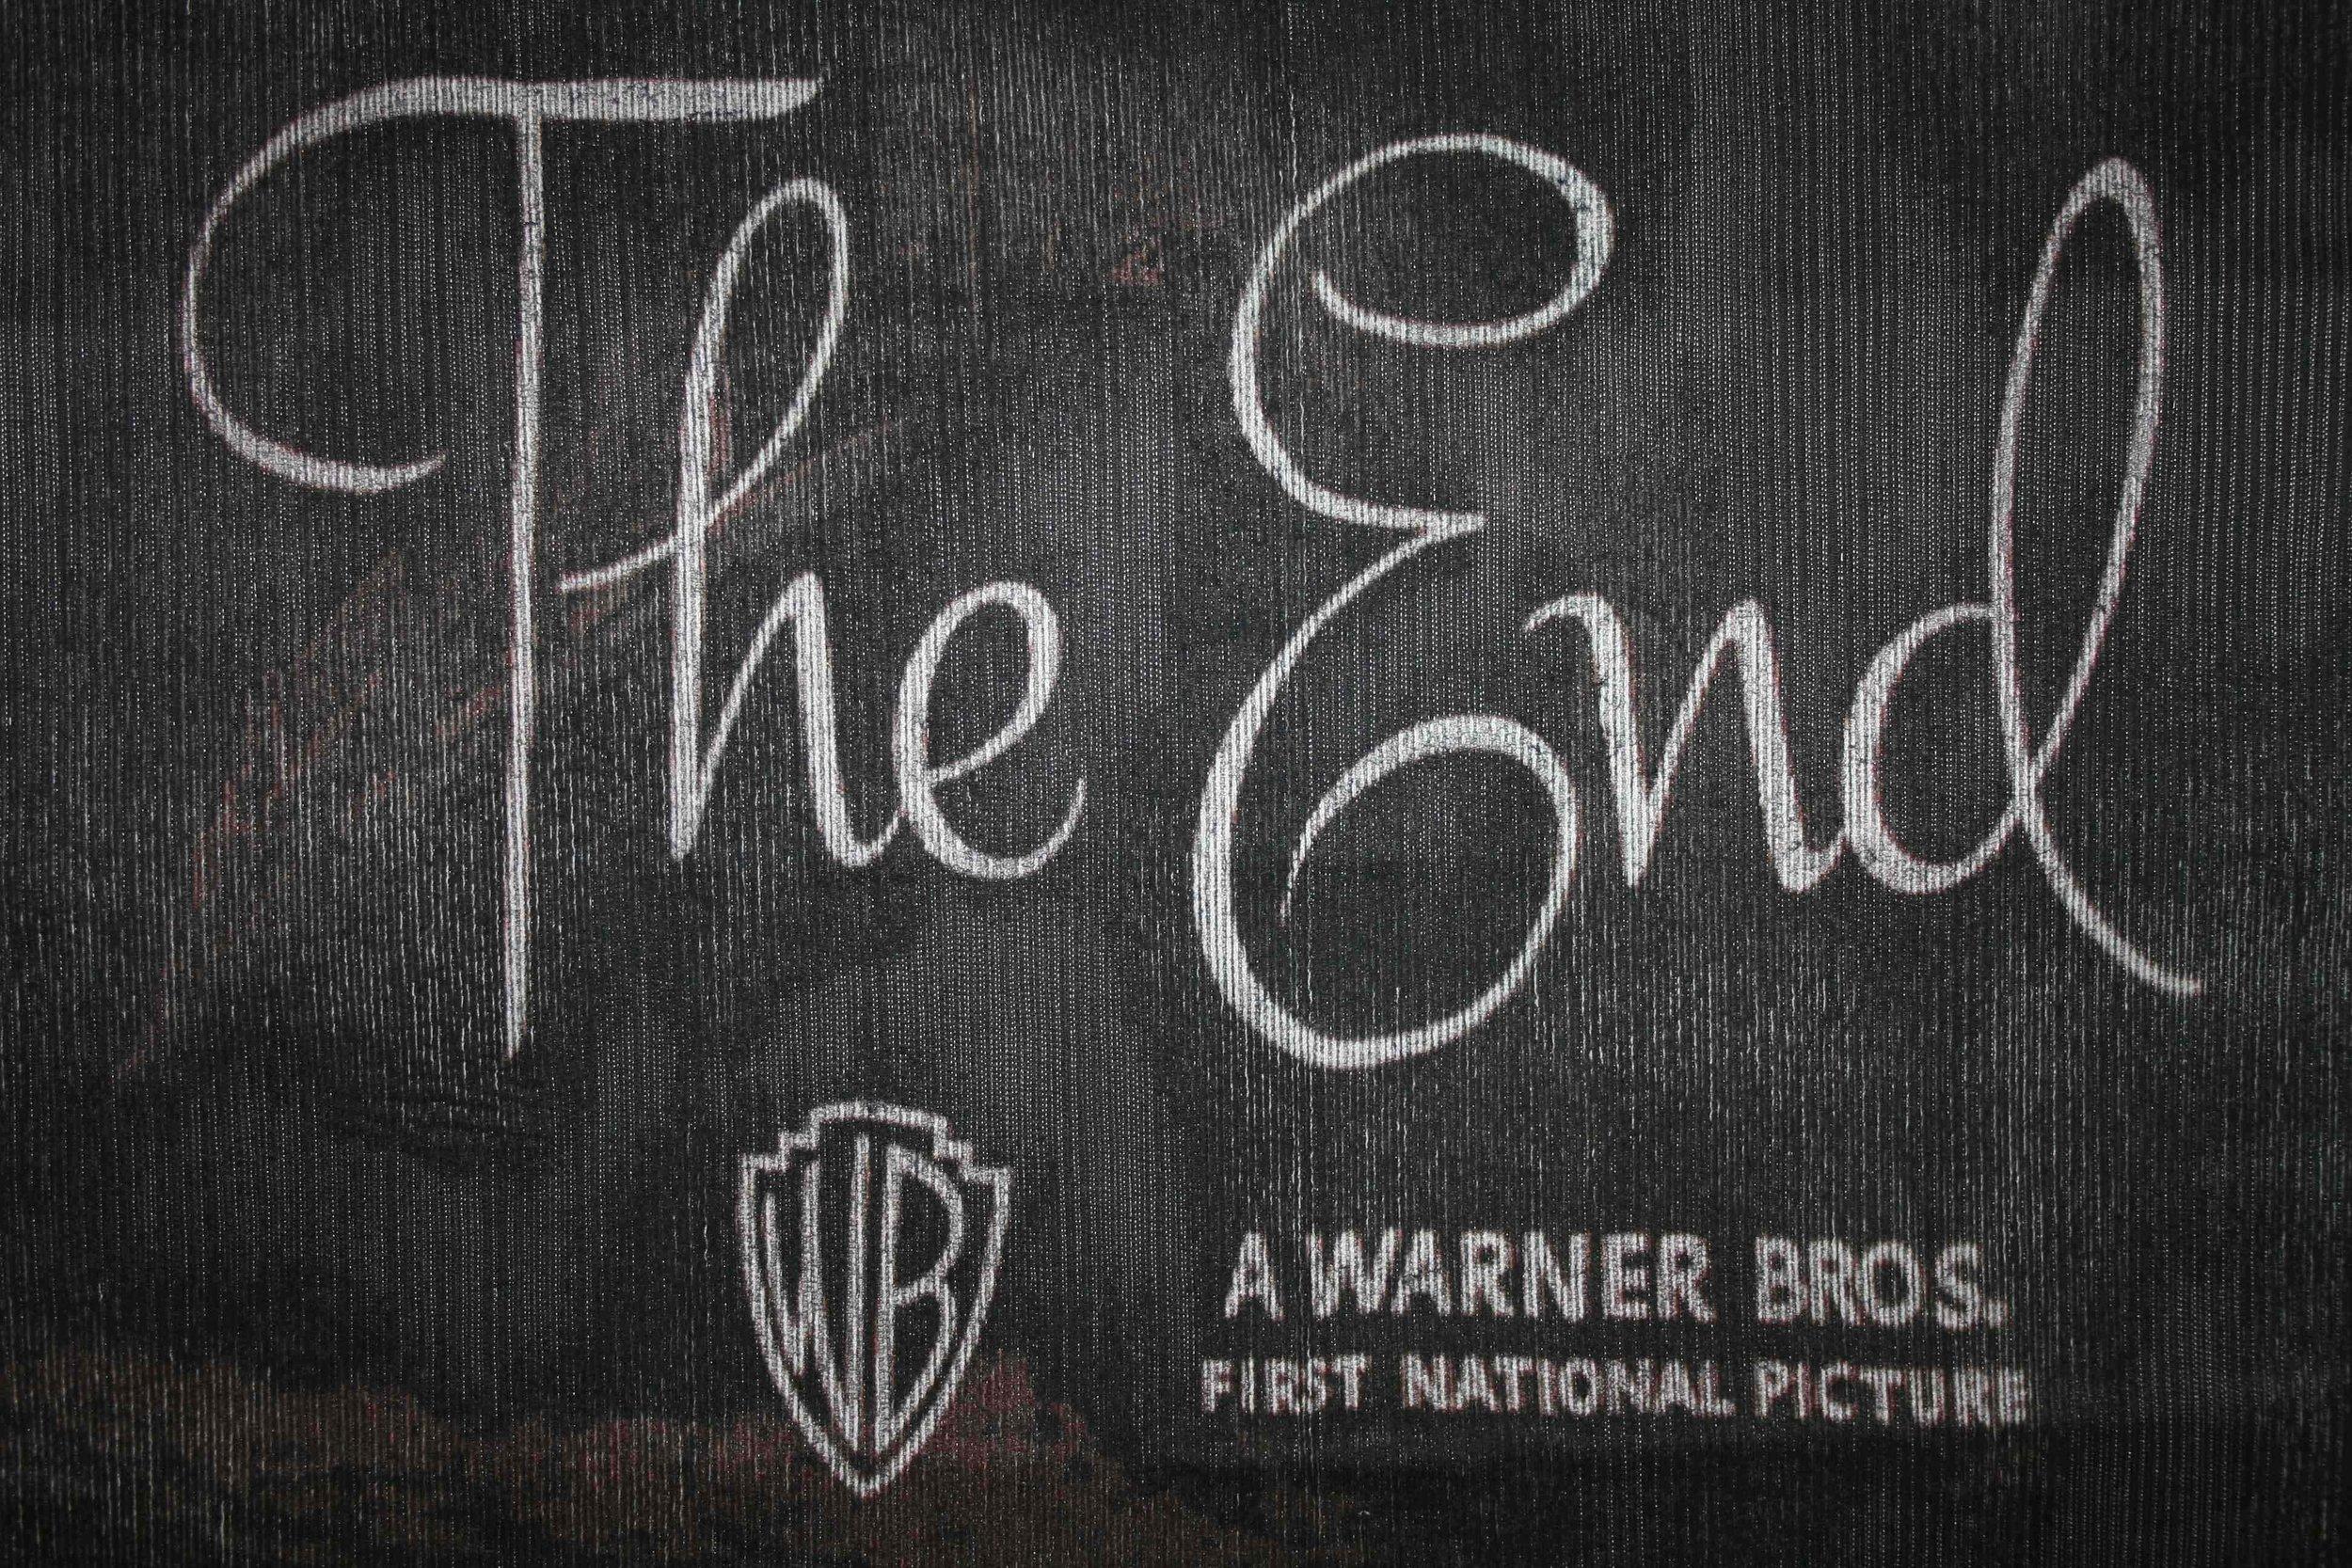 Nigel Hurlstone 'The End' 3.jpg